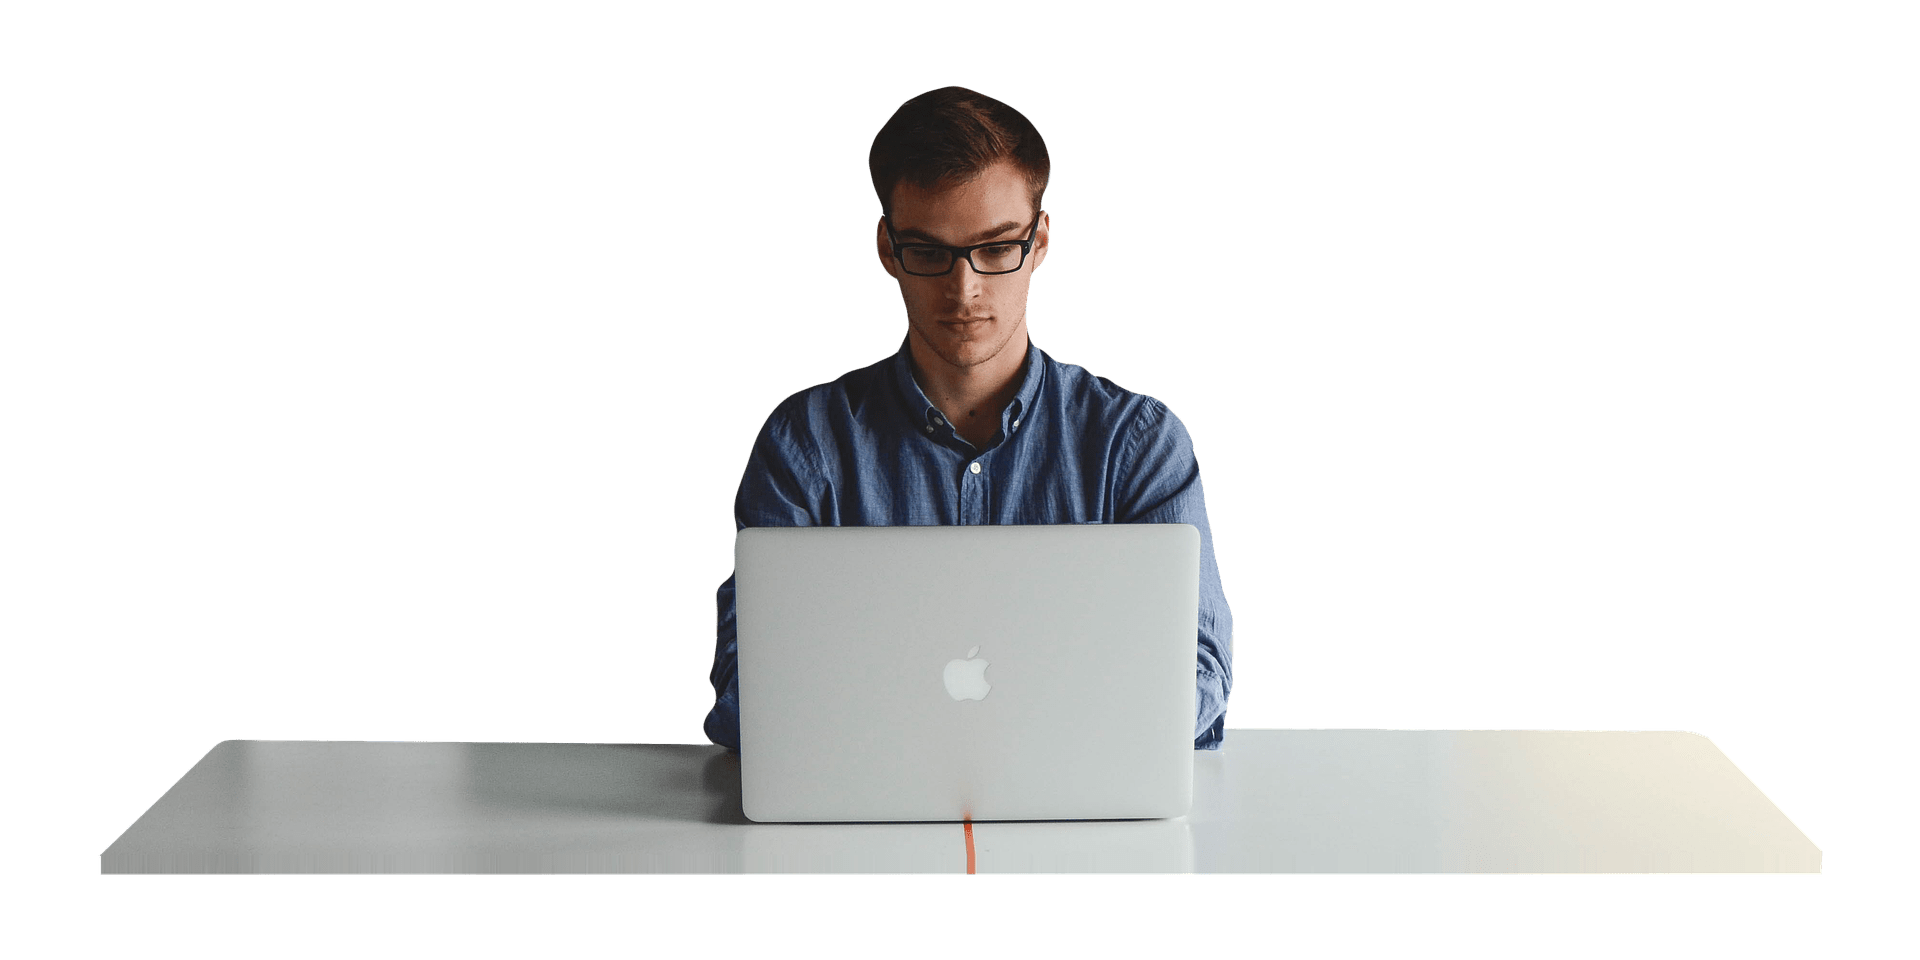 Download - Man At Desk PNG